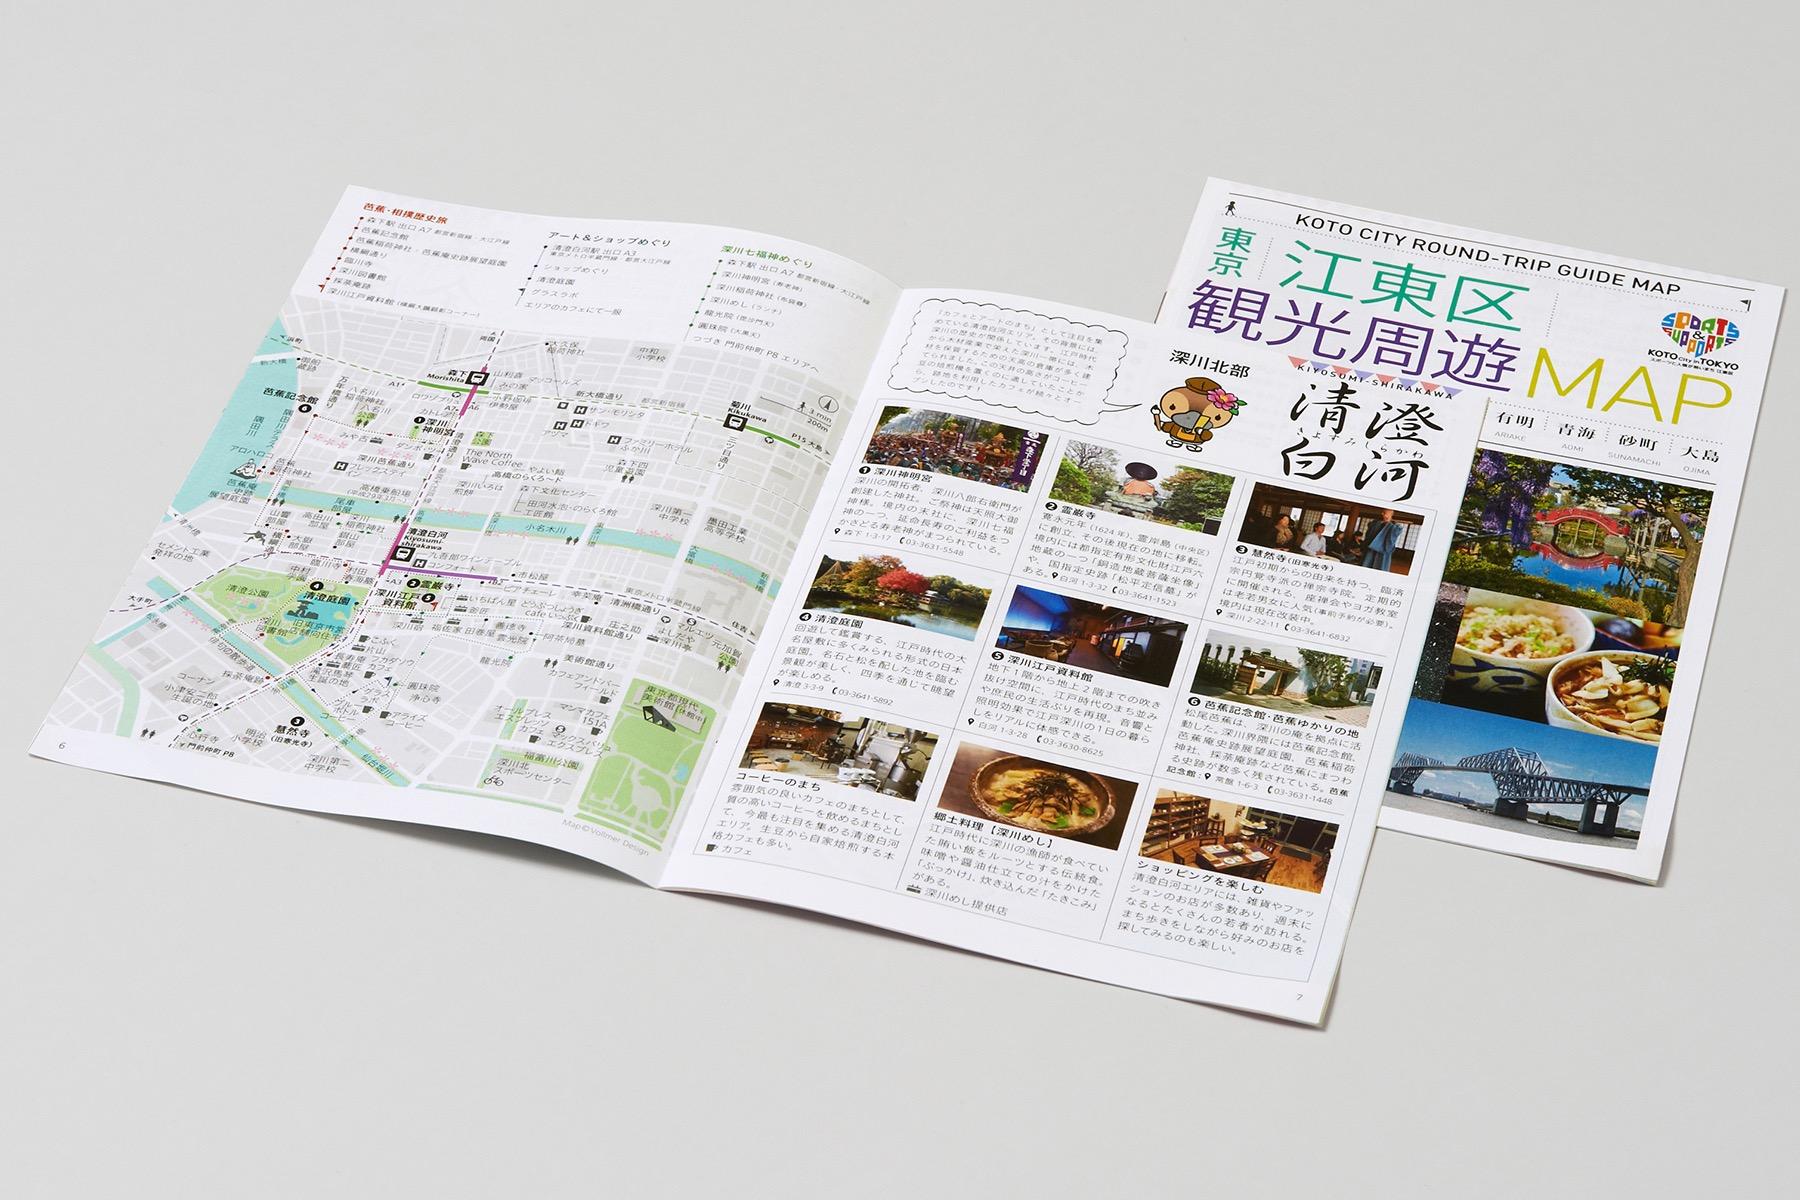 Koto City Guide Map